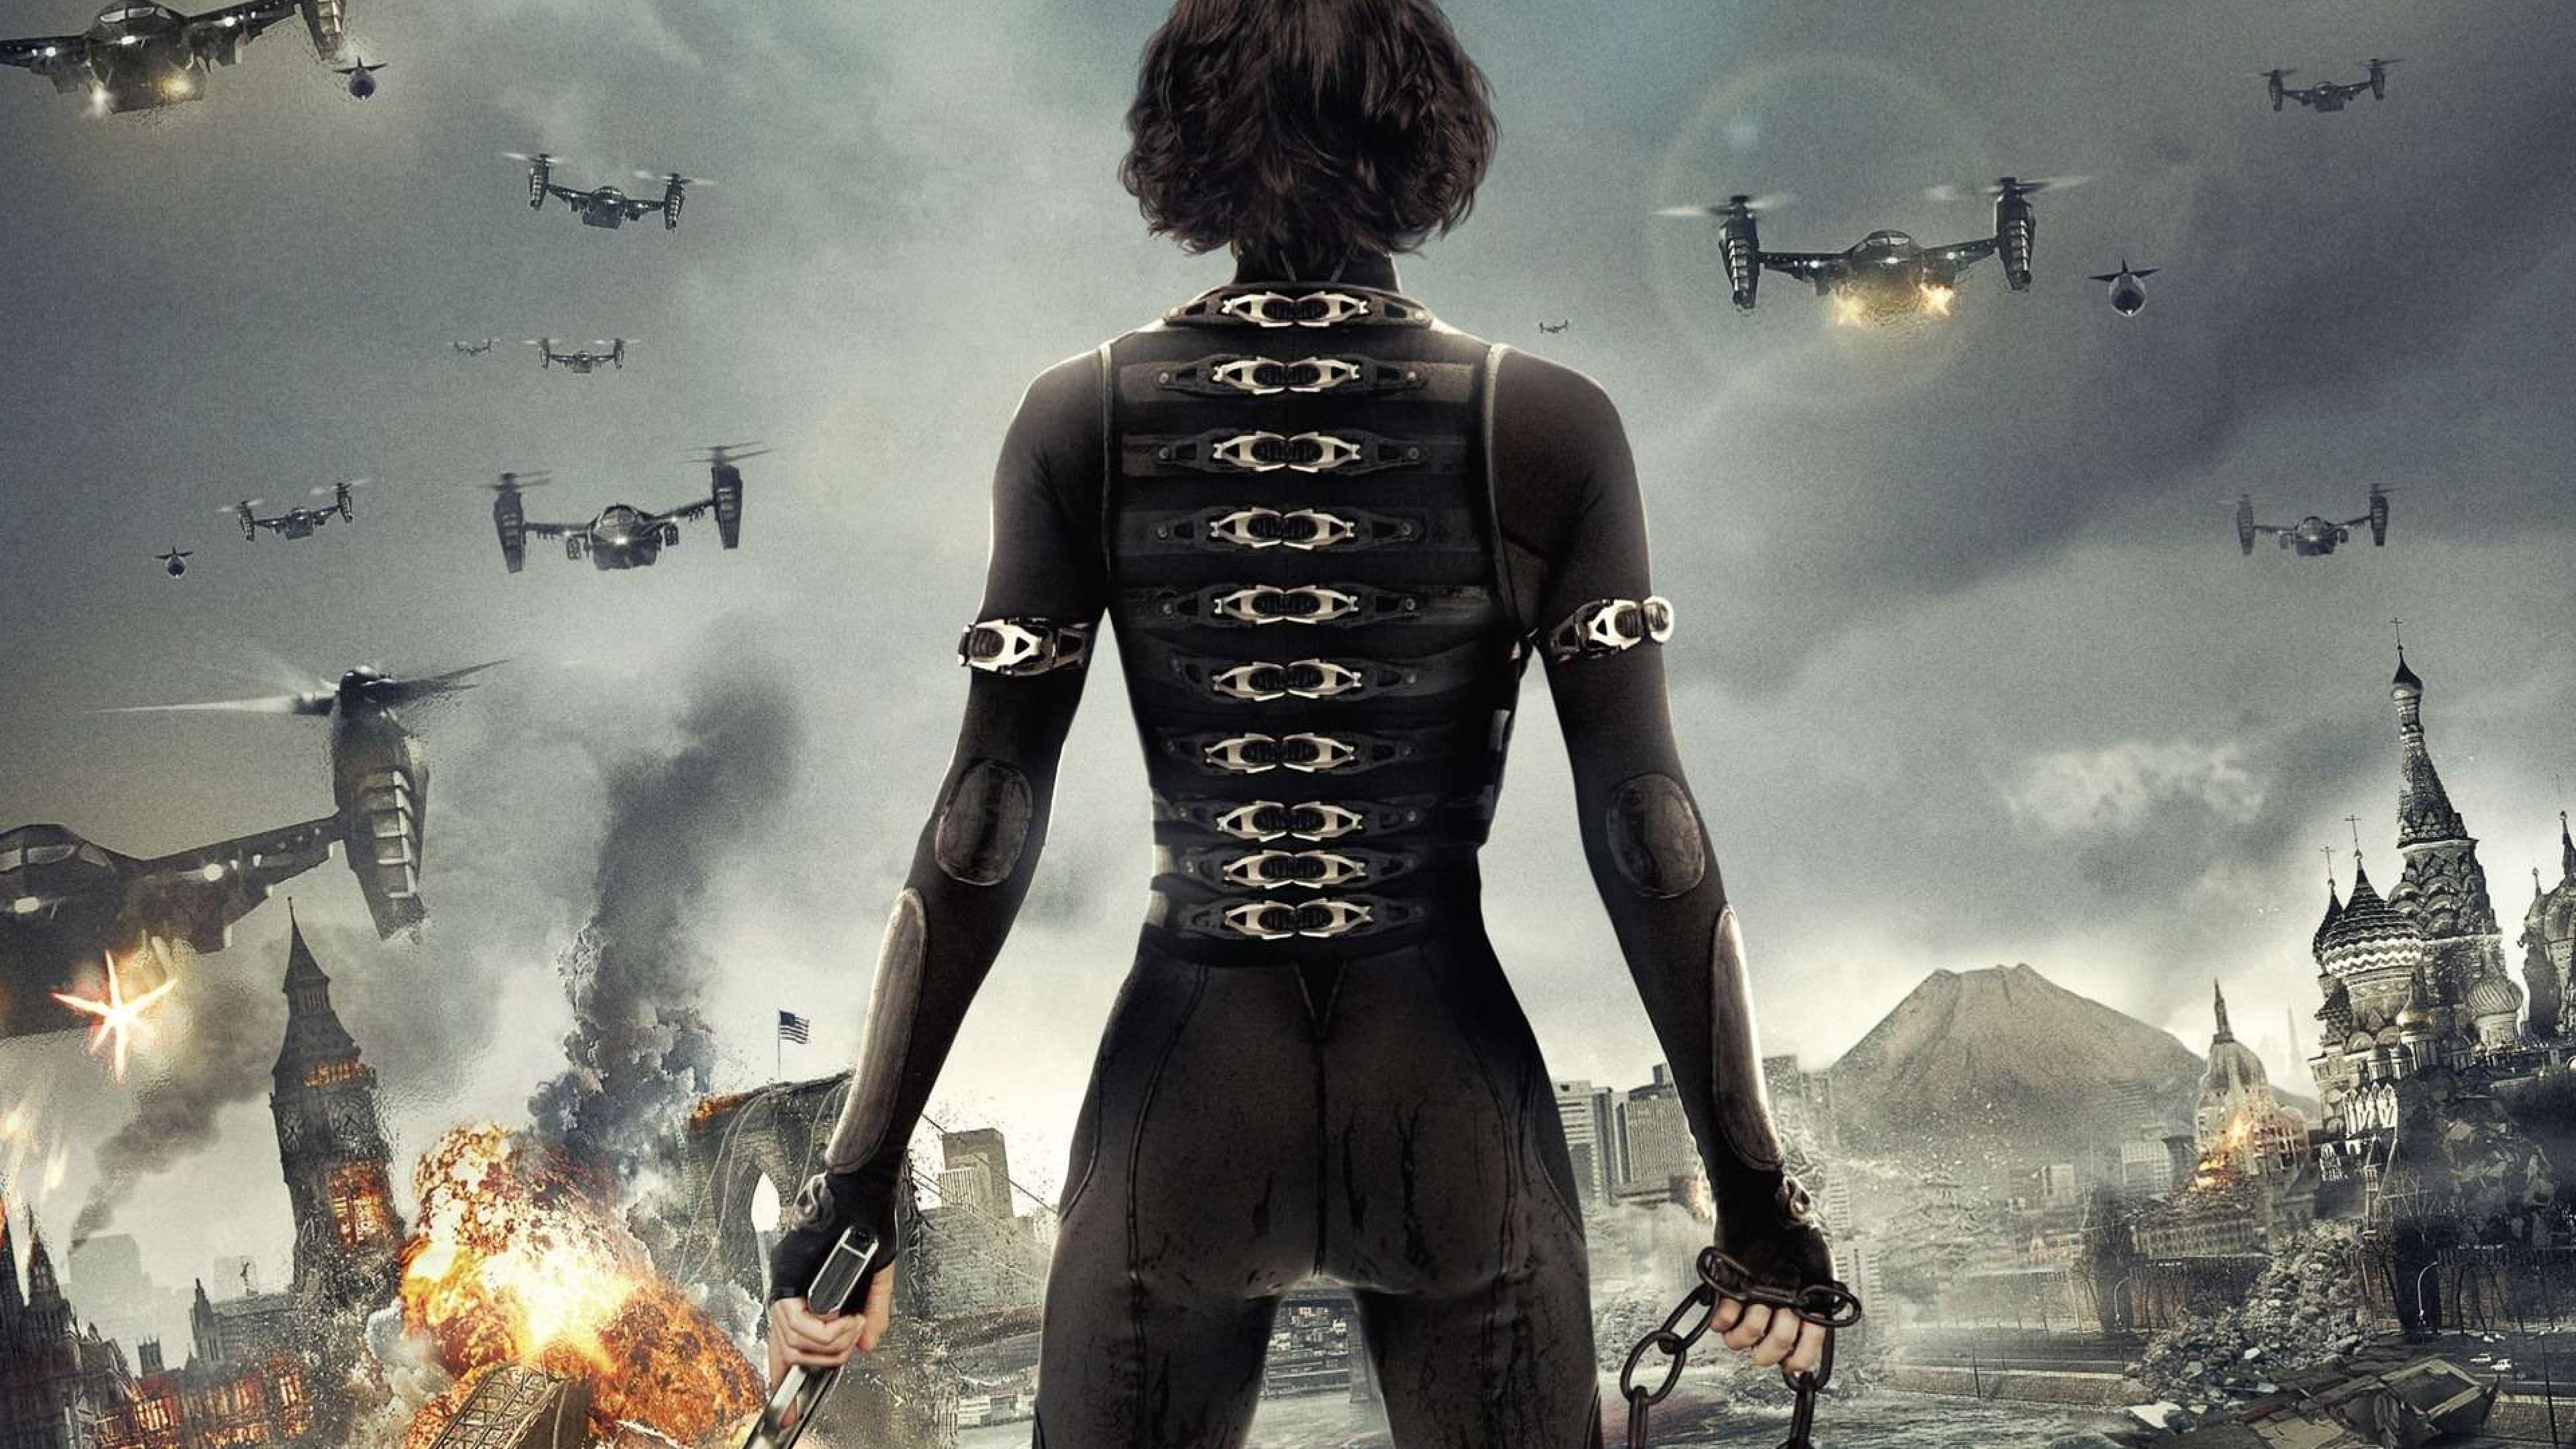 Resident Evil Movie Wallpaper Hd